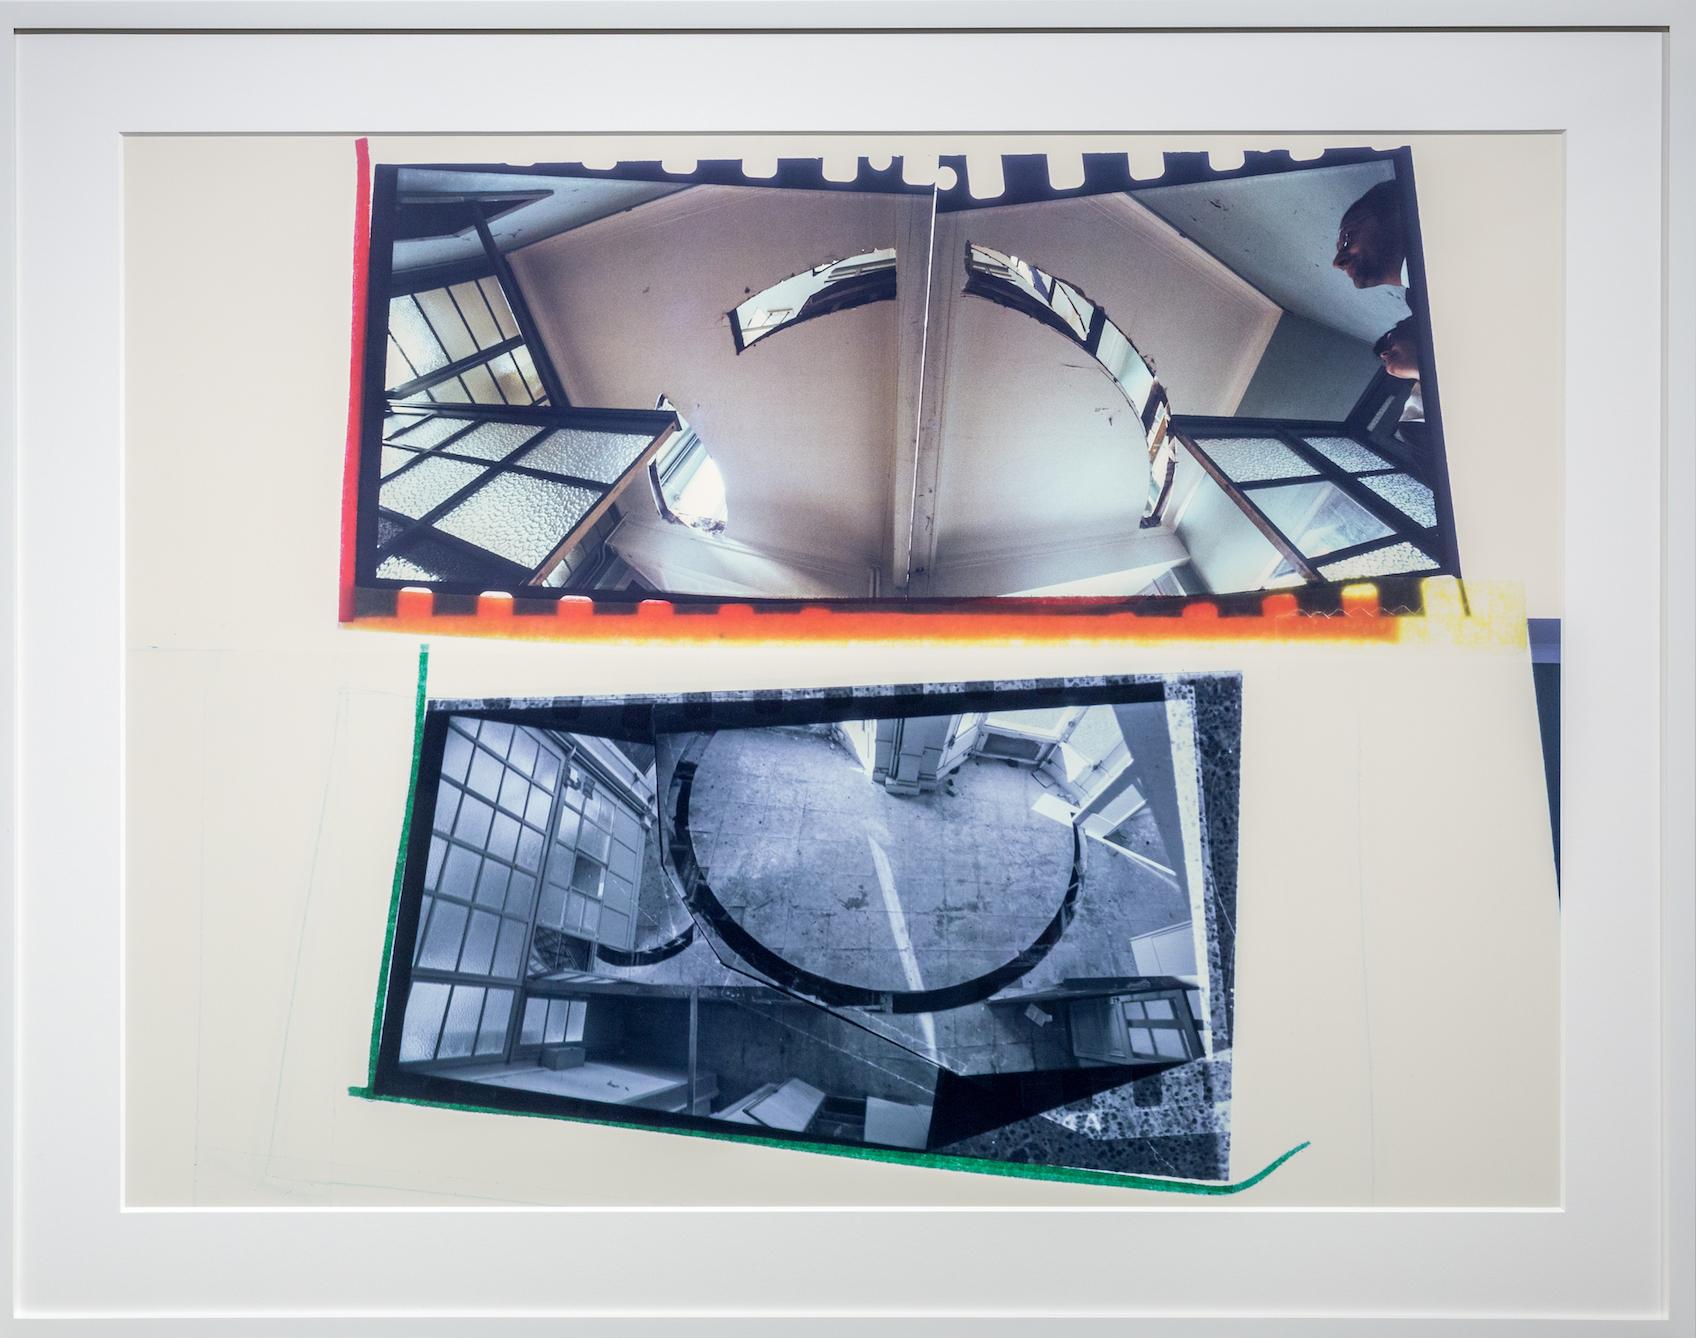 Gordon Matta-Clark, Office Baroque, Cibachrome, c. 1977, Courtesy of Jean-Paul Najar Foundation